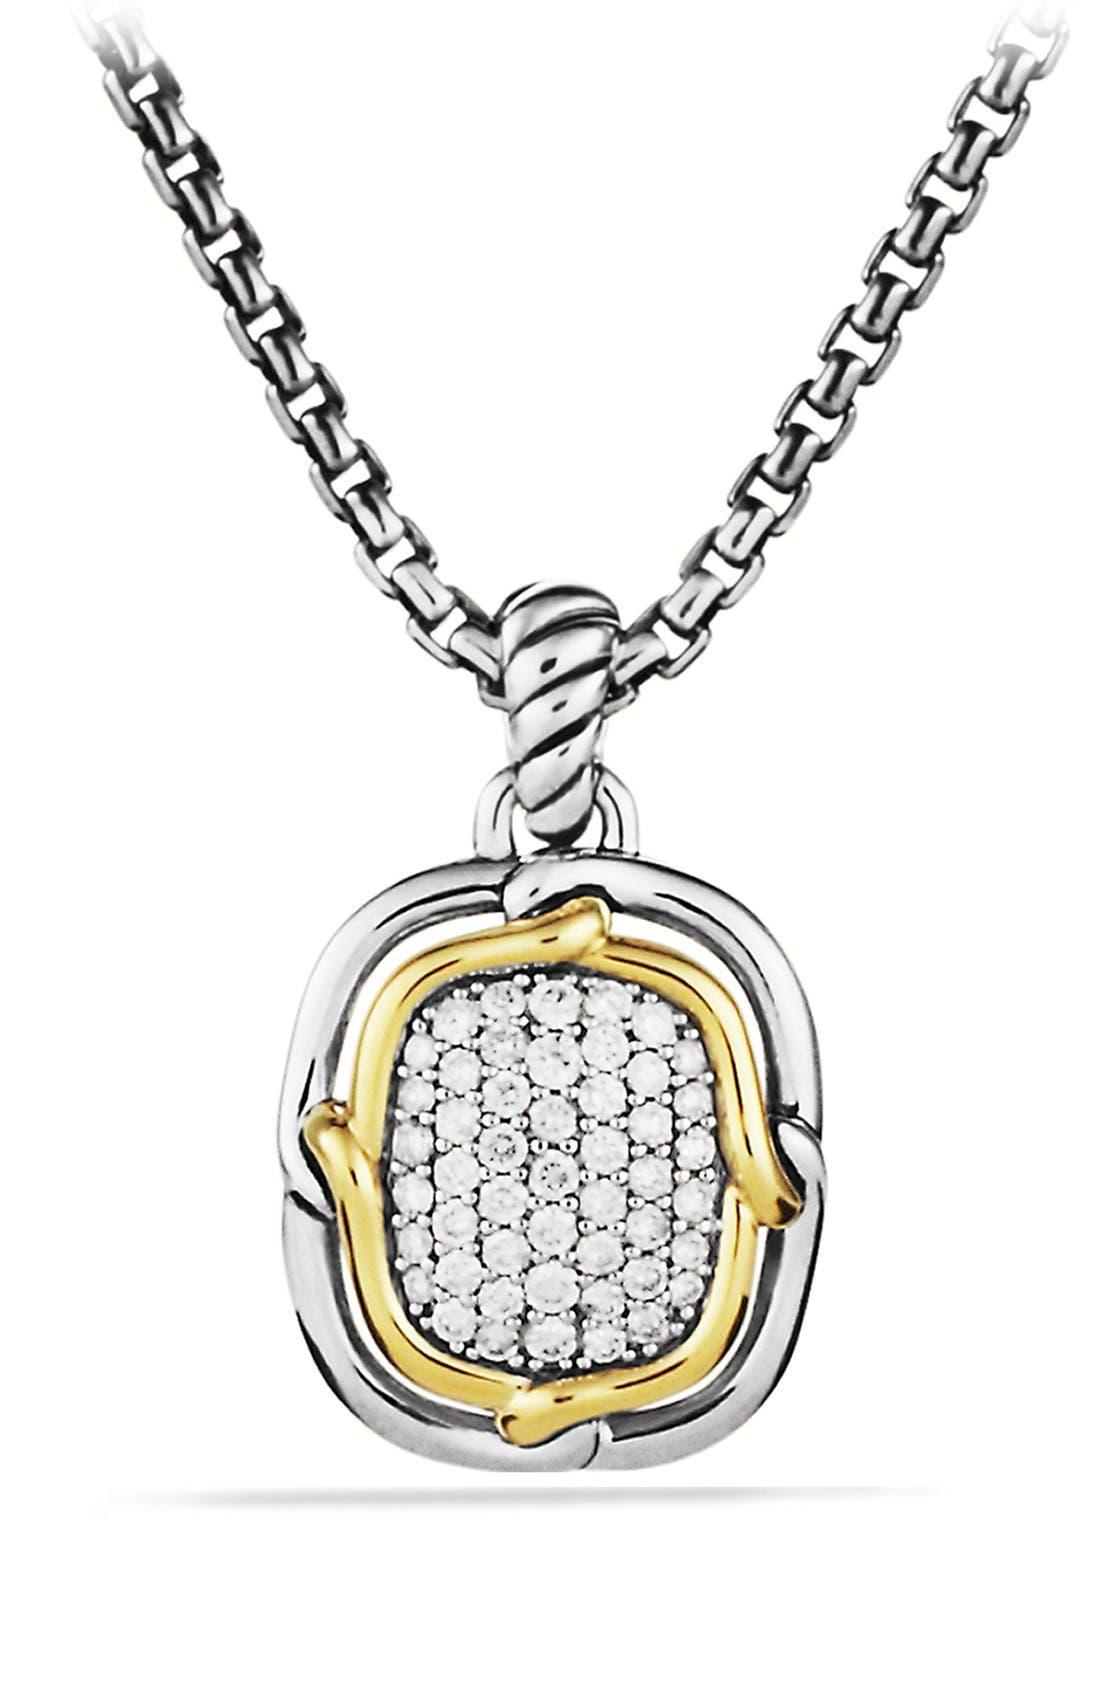 Alternate Image 1 Selected - David Yurman 'Labyrinth' Pendant with Diamonds and Gold